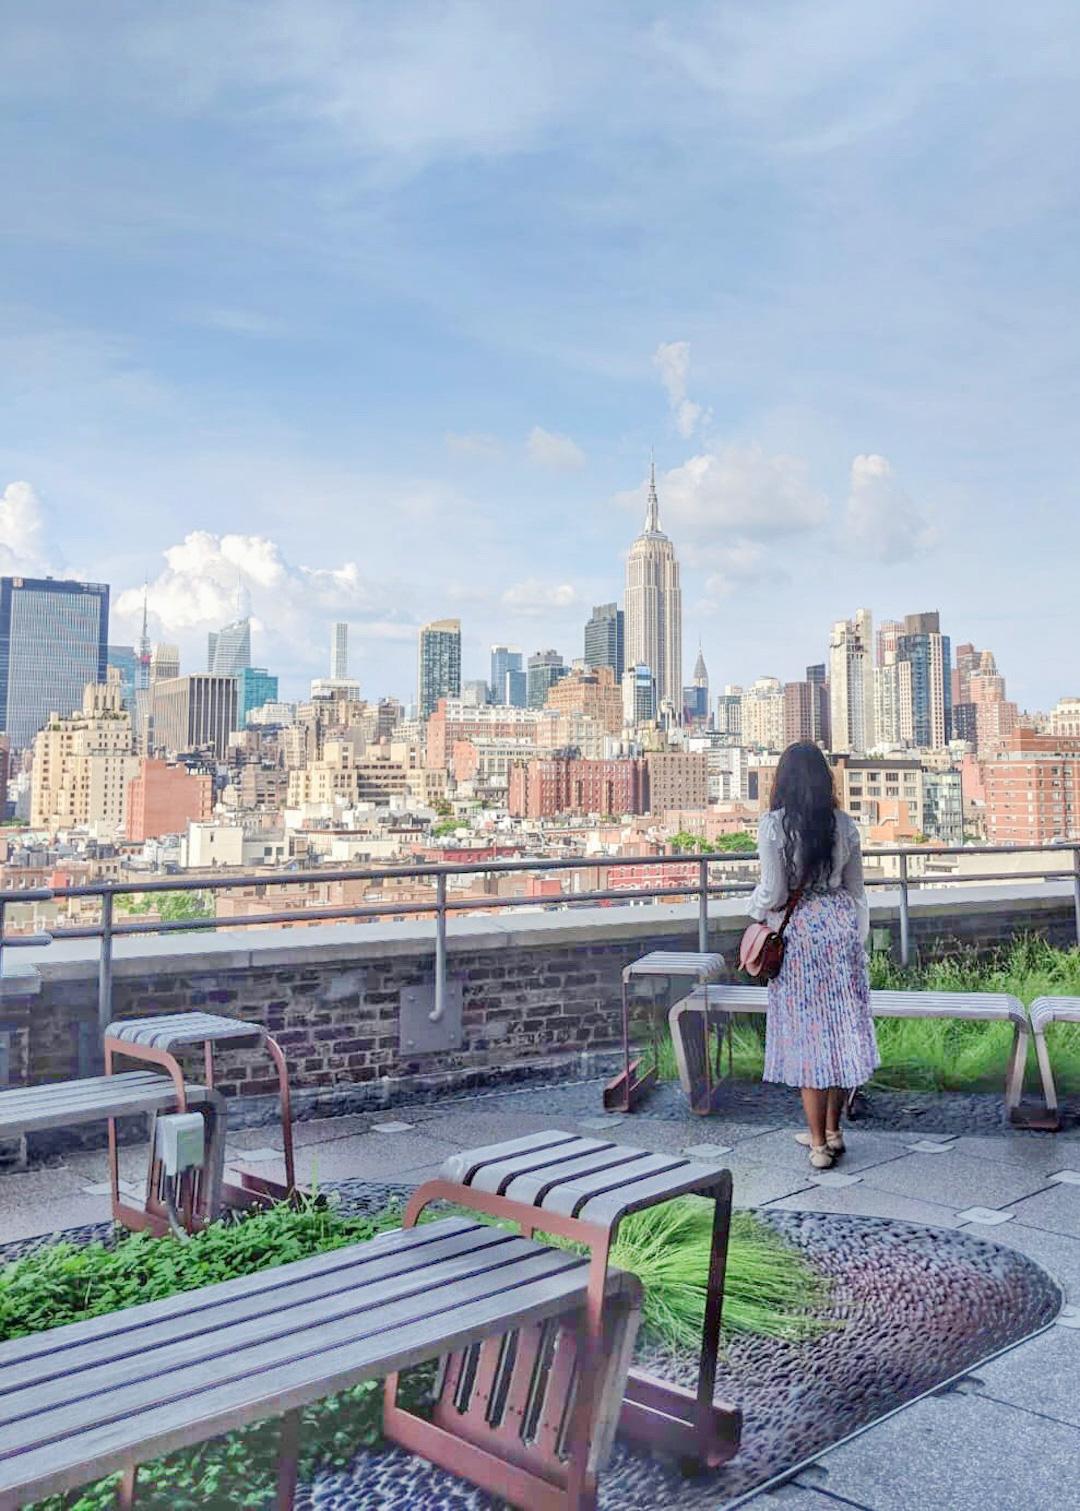 Her_Travel_Edit_New_York_Views